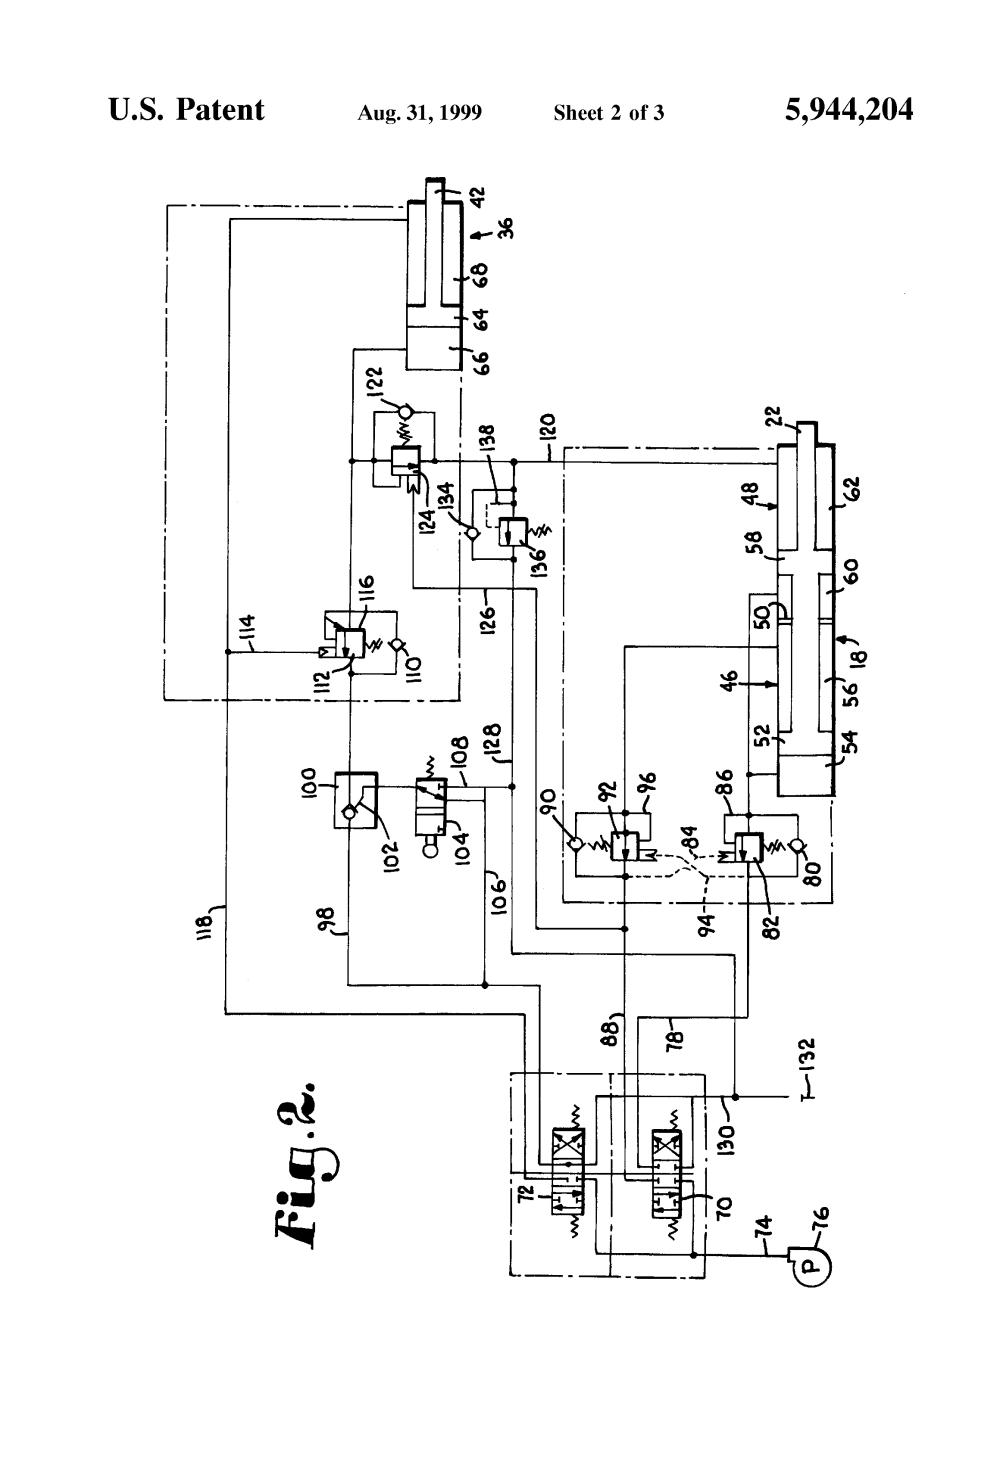 medium resolution of altec hydraulic lift diagram for wiring wiring diagram mega altec hydraulic lift diagram for wiring